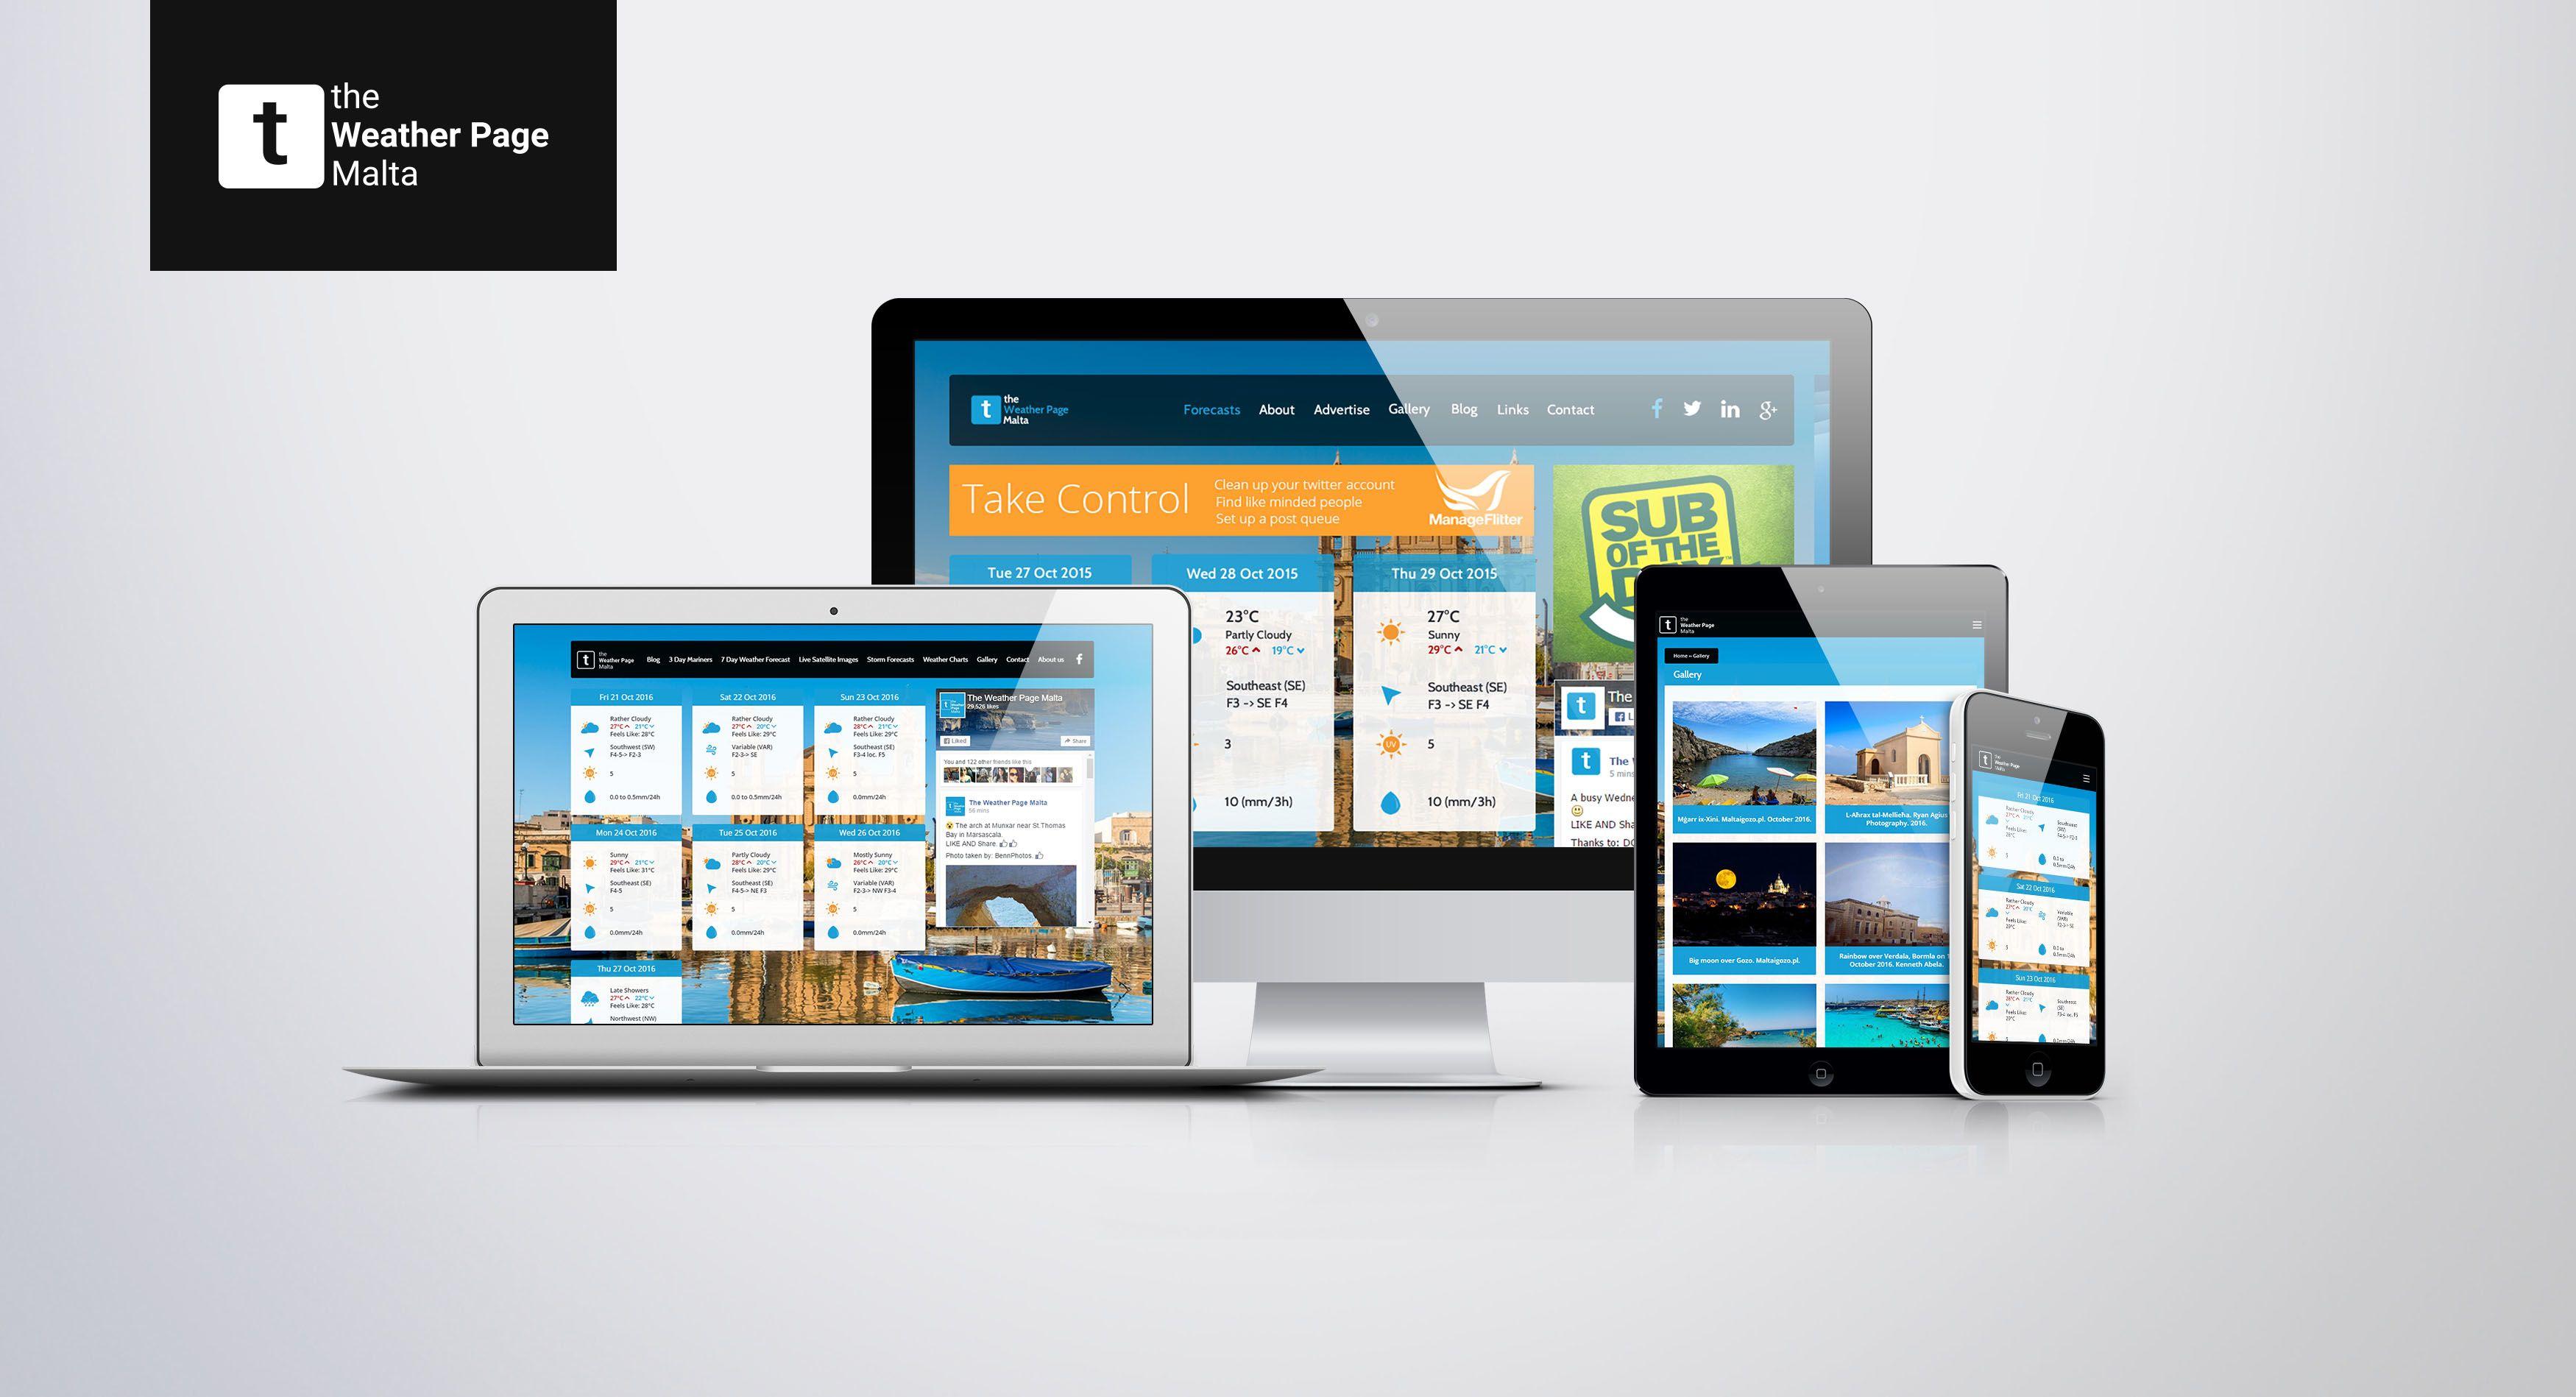 The Weather Page Responsive Website Design & Development